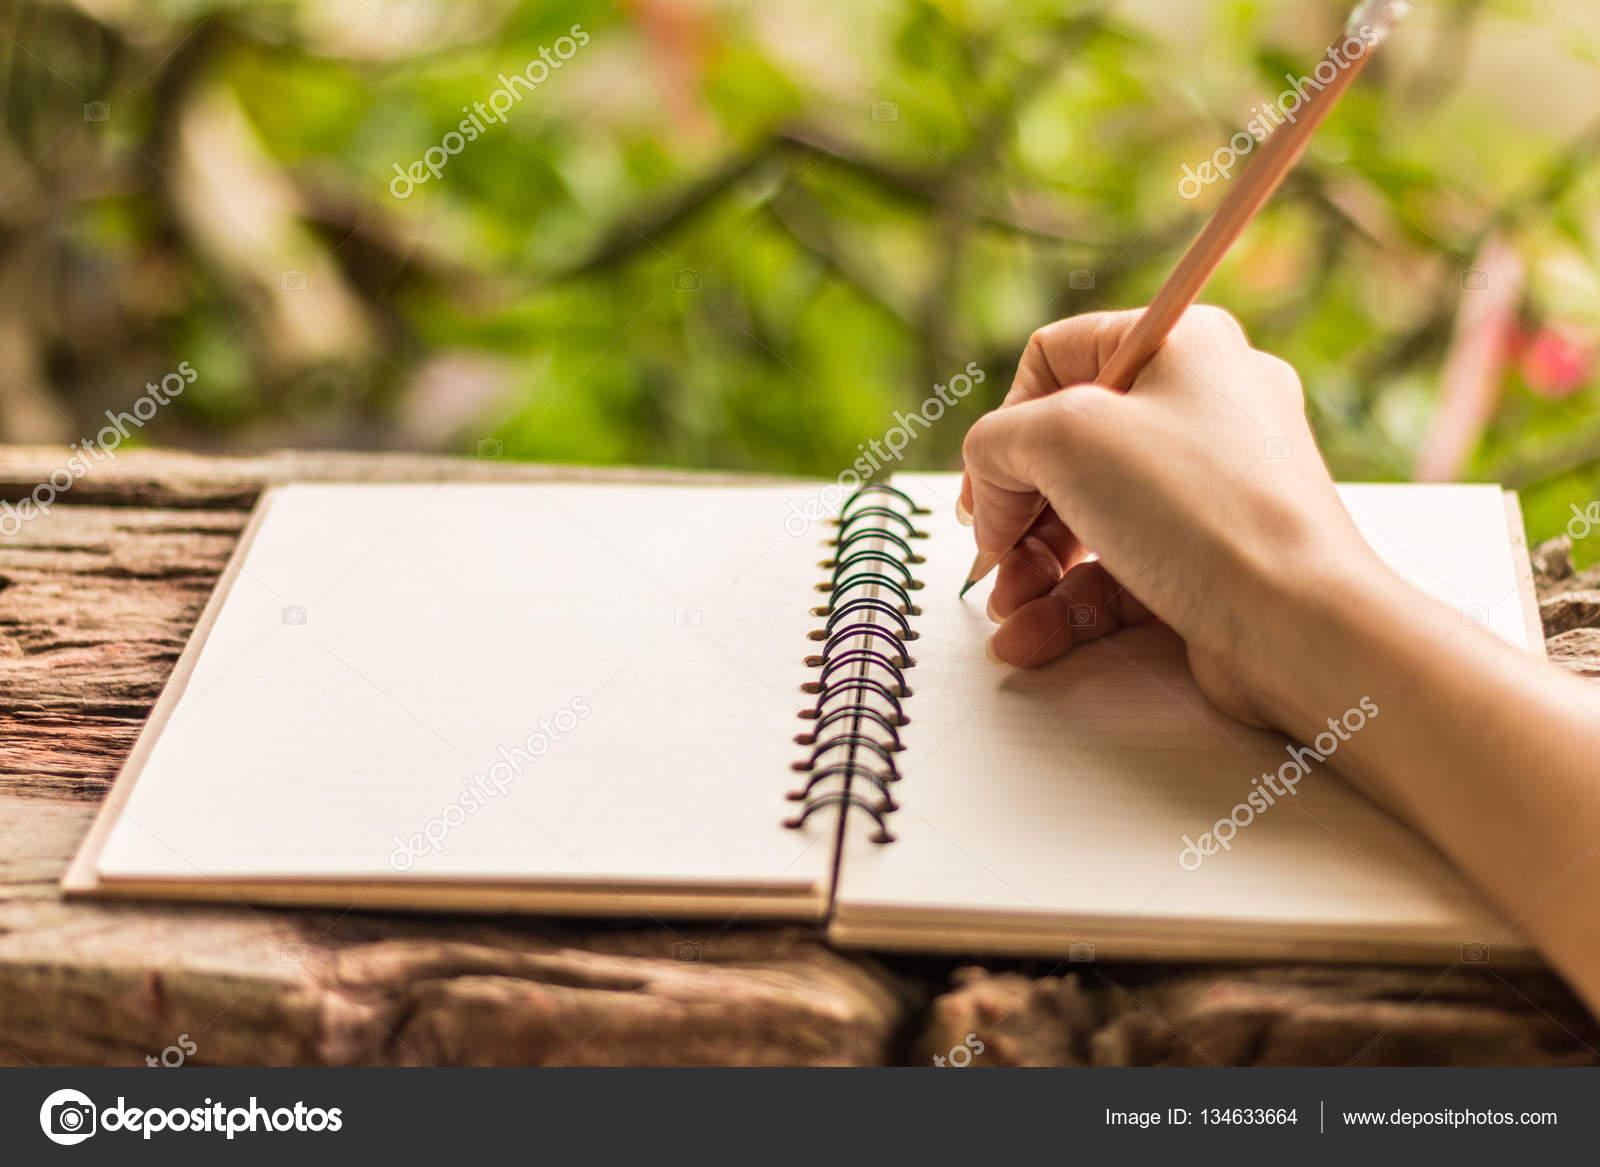 hands of girl writing - hands of girl writing with a pencil in